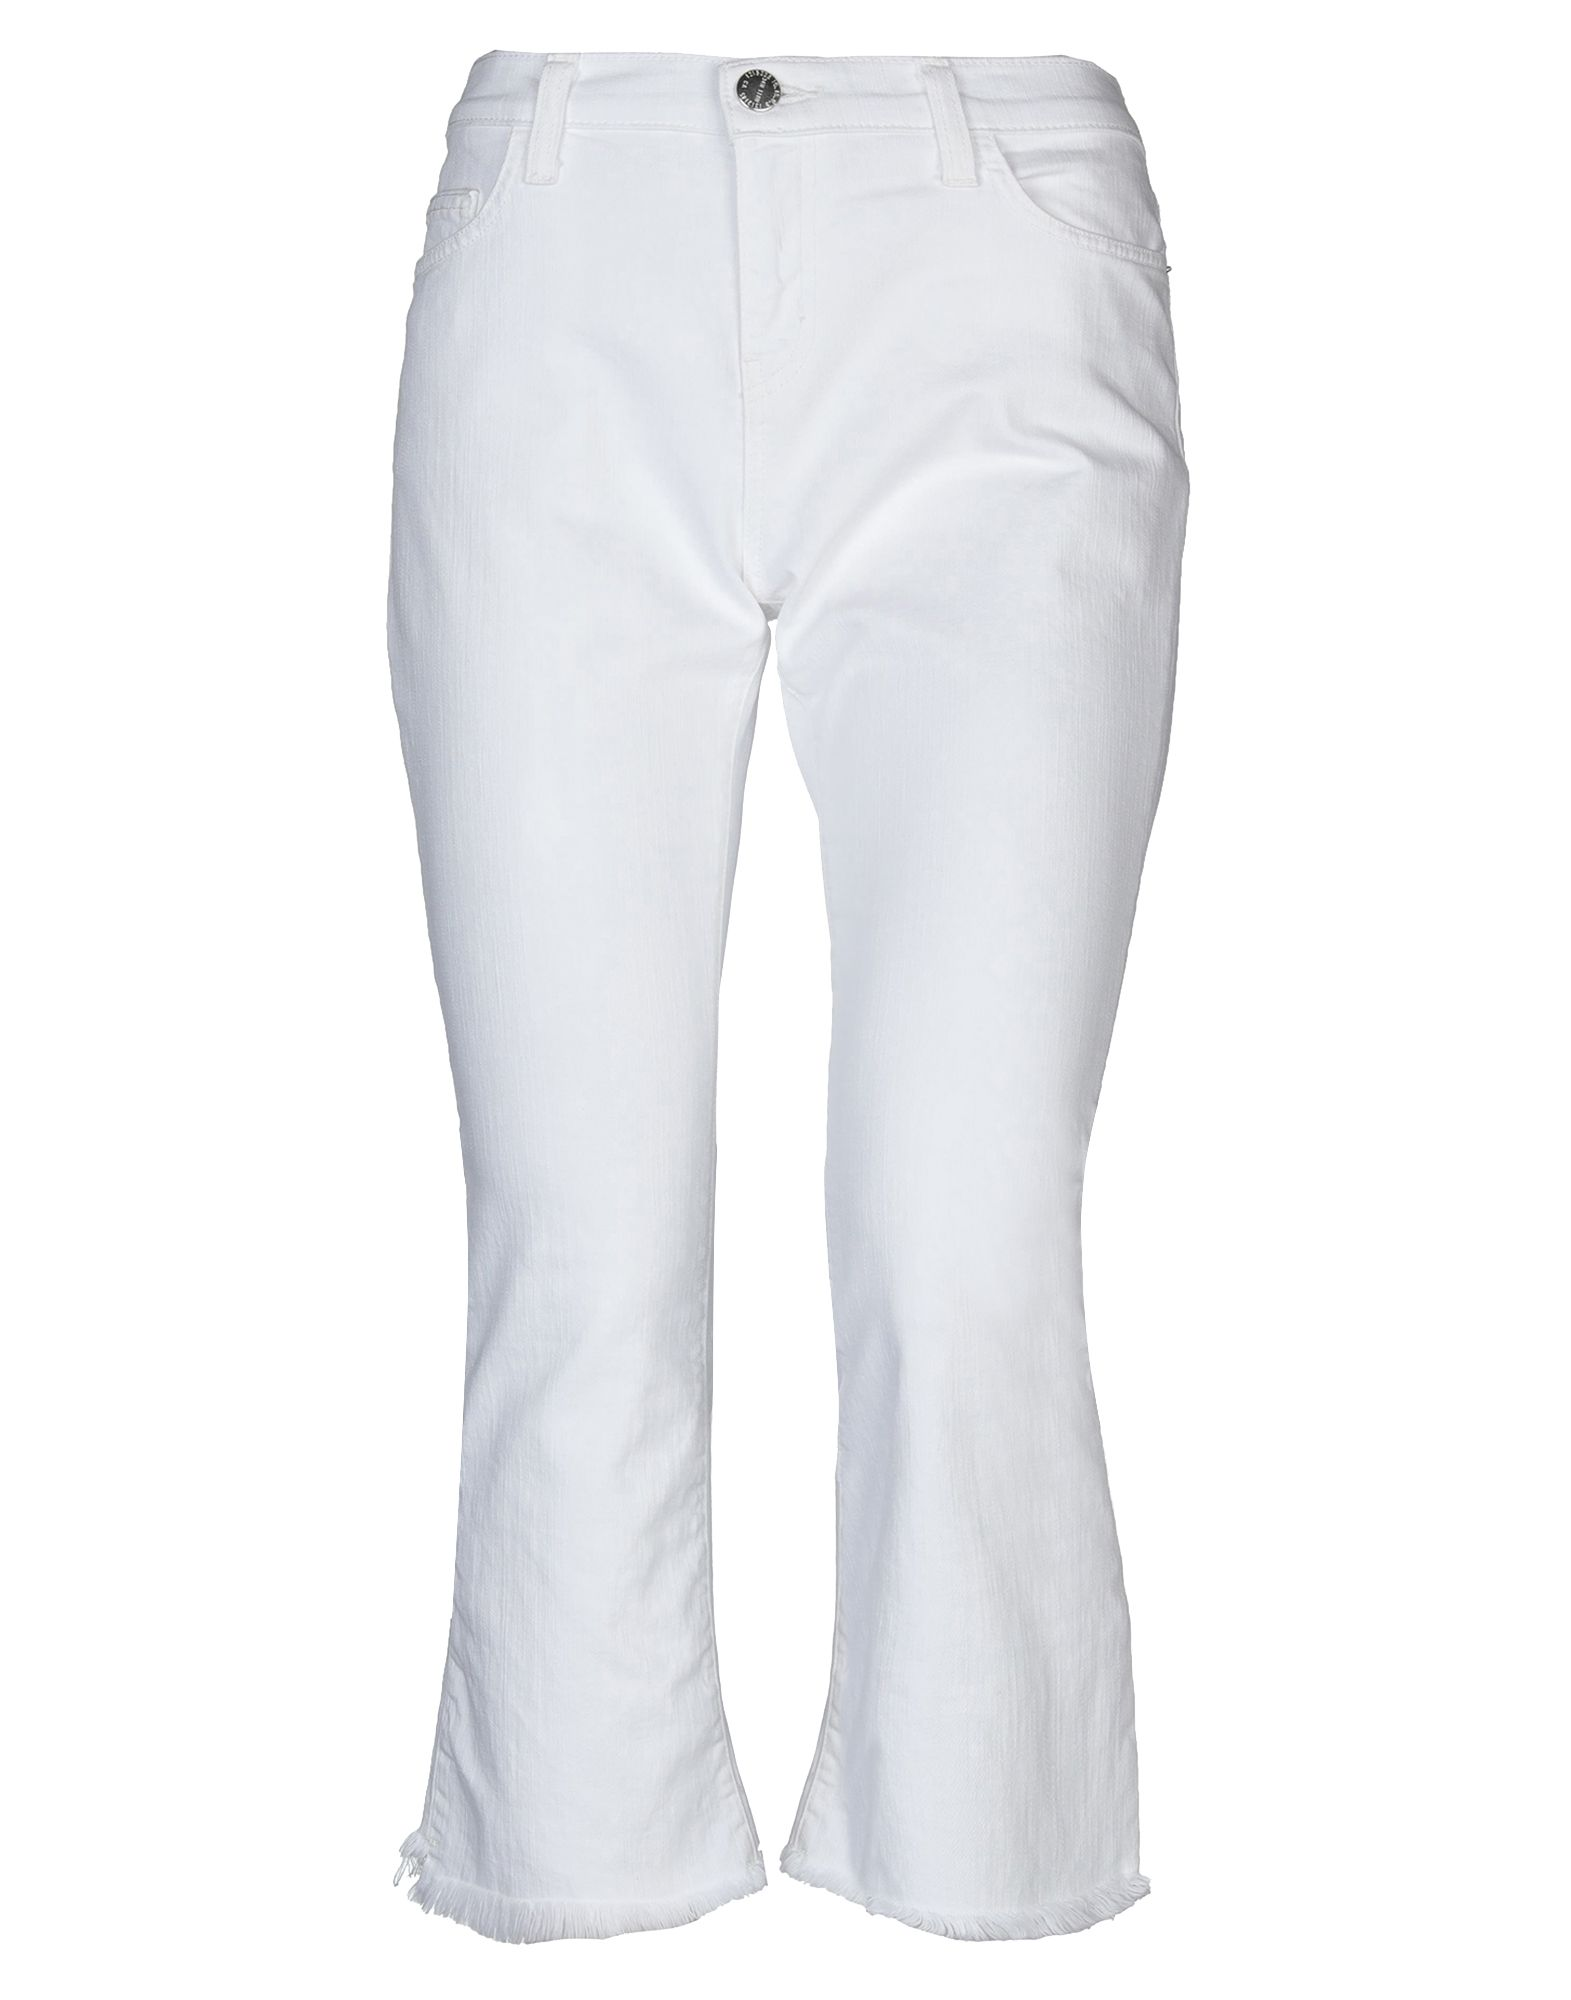 CURRENT/ELLIOTT Джинсовые брюки-капри luxury stand flip